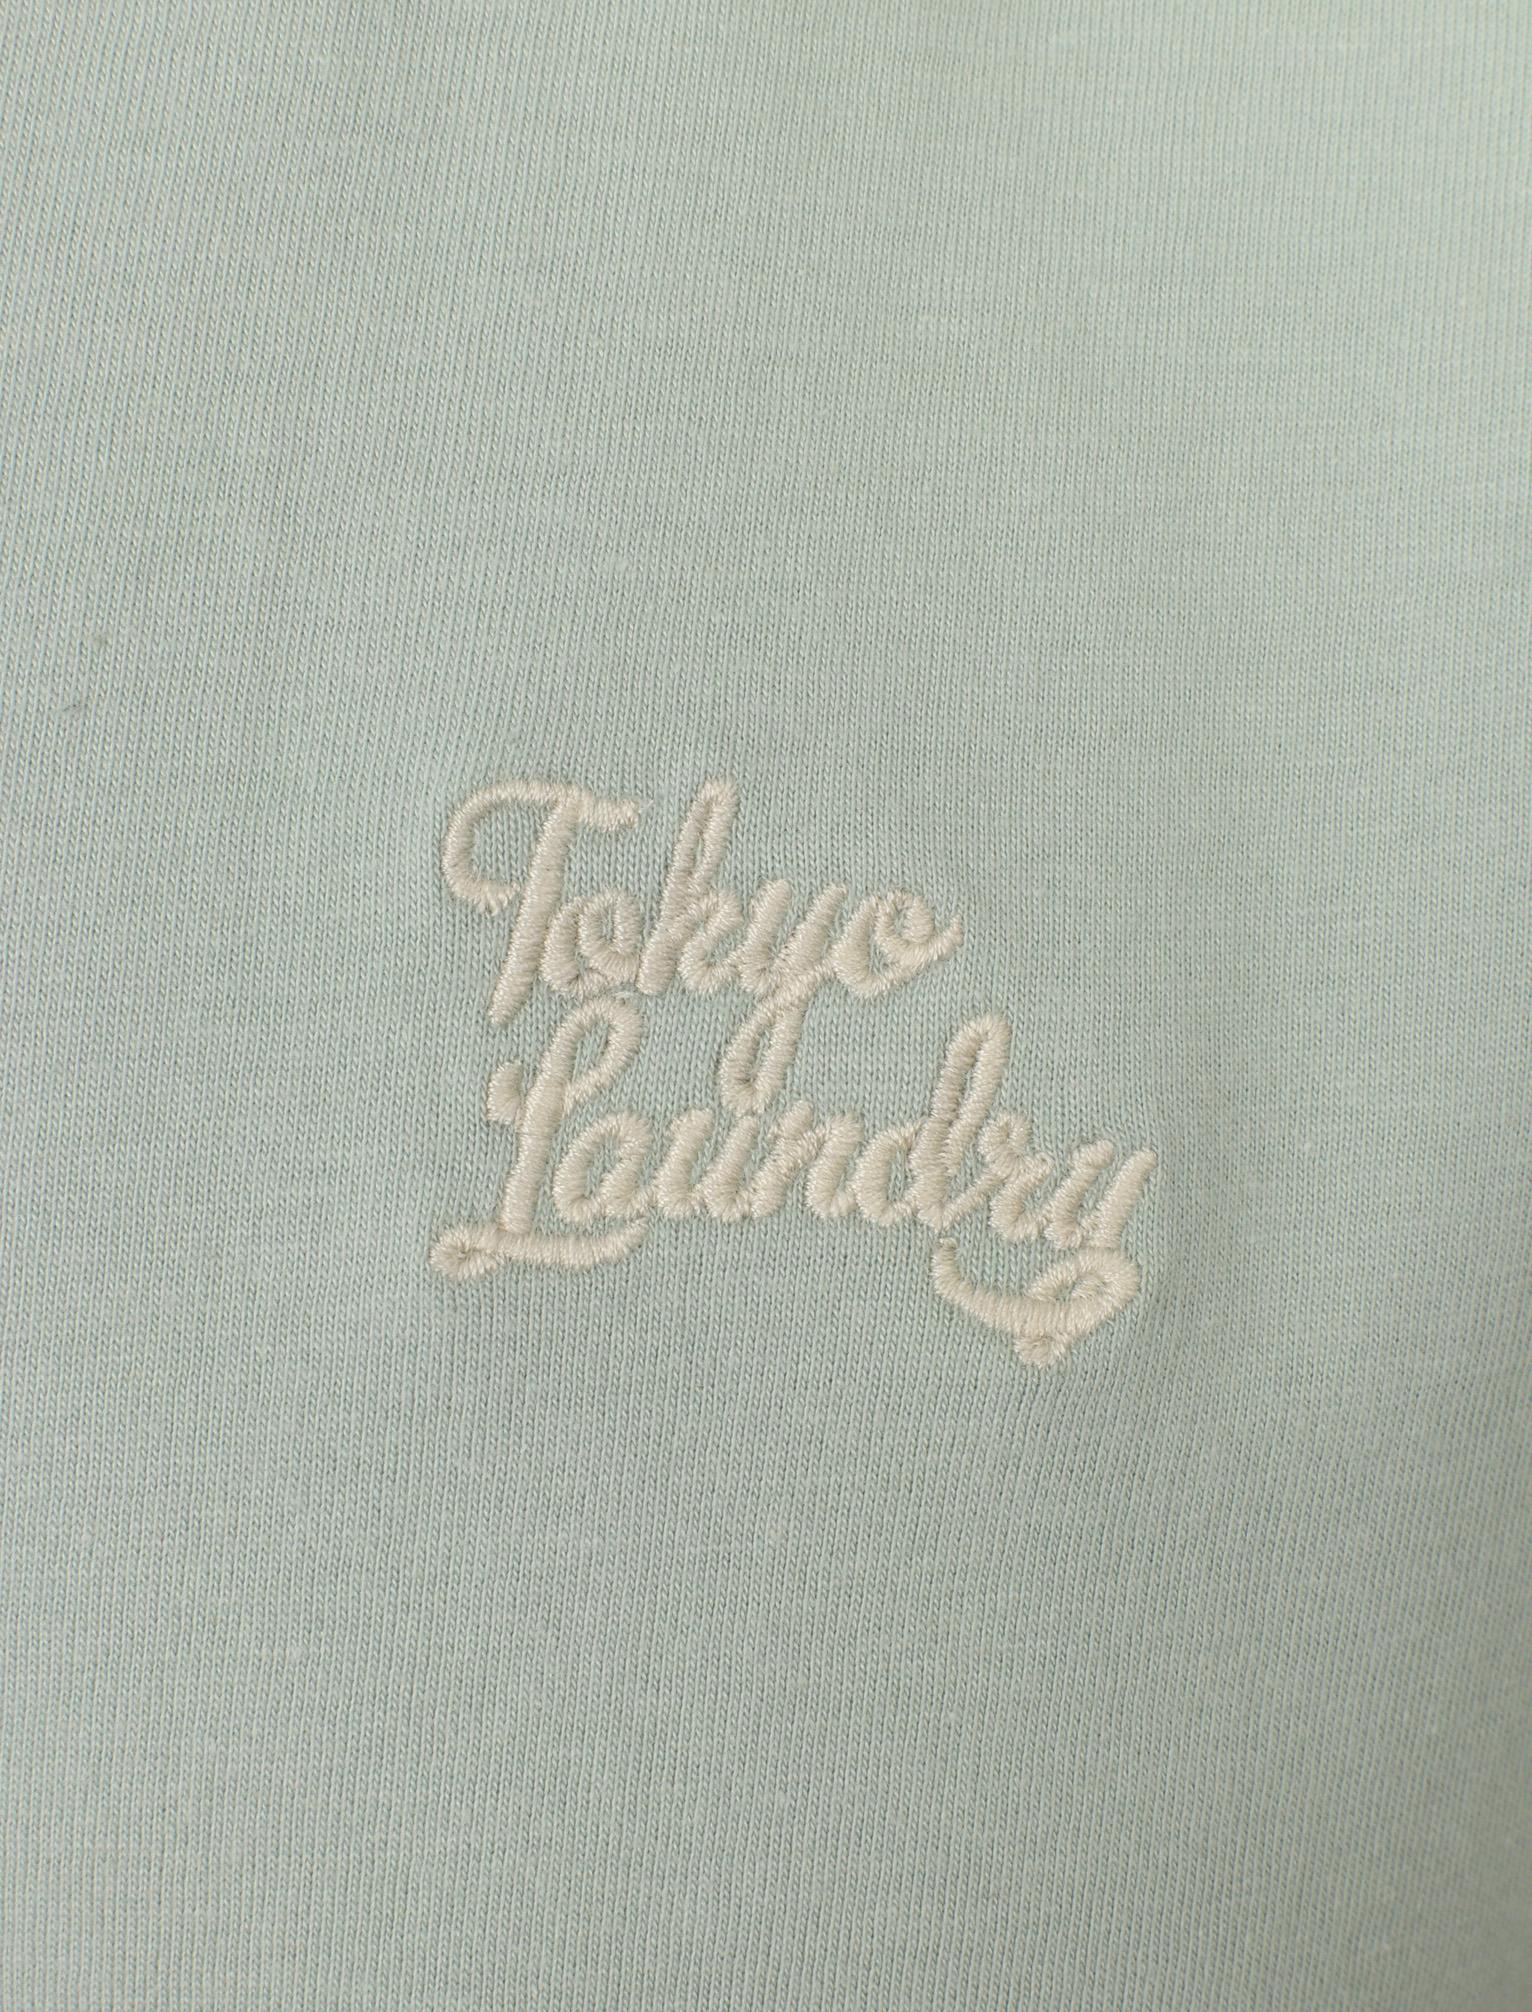 New-Mens-Tokyo-Laundry-Montecarlo-Crew-Neck-Cotton-Rich-Soft-T-Shirt-Size-S-XXL thumbnail 22